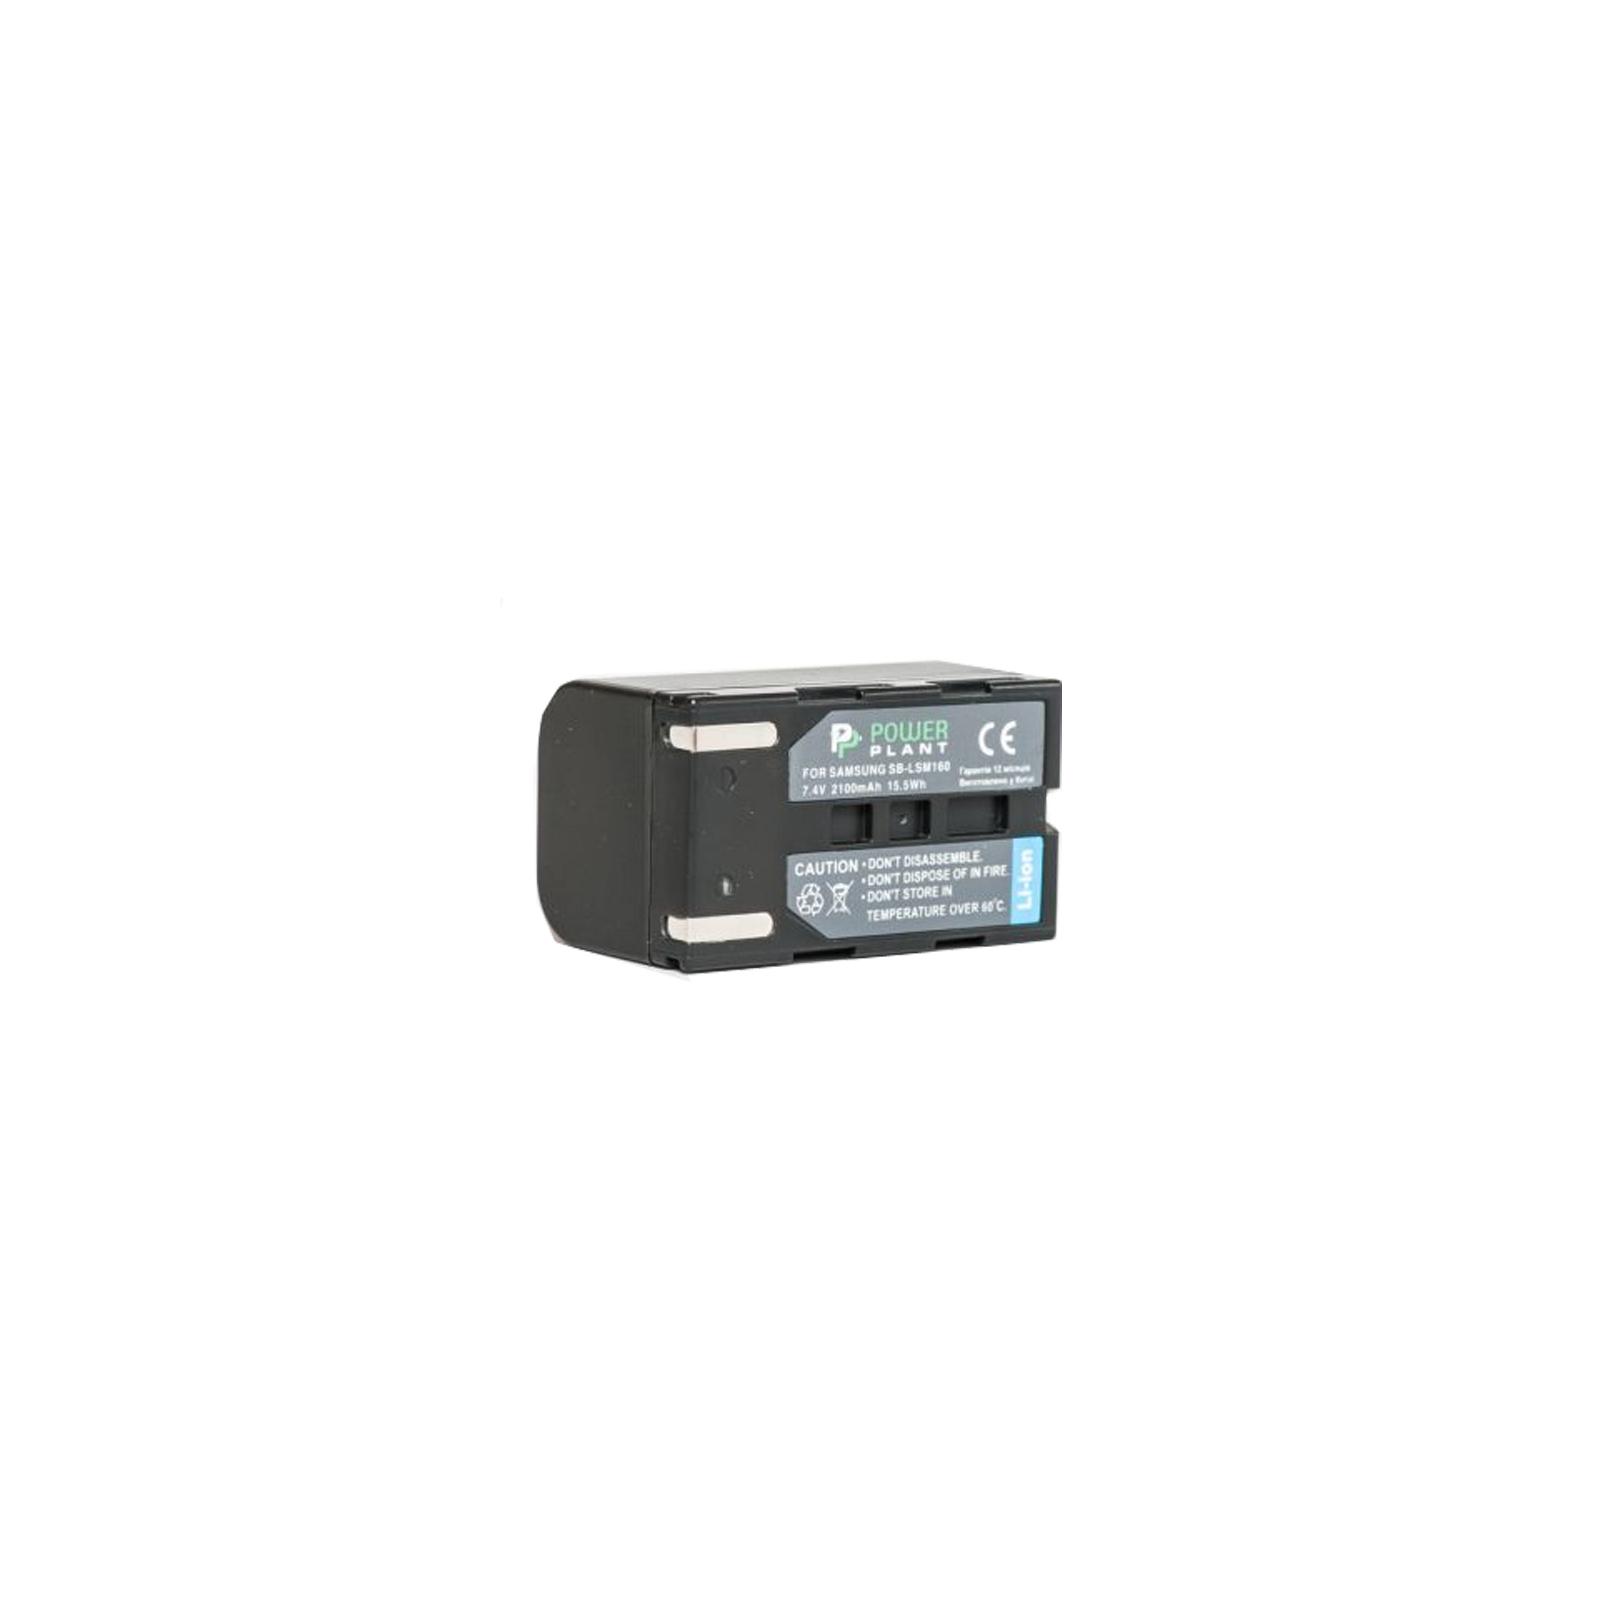 Аккумулятор к фото/видео PowerPlant Samsung SB-LSM160 (DV00DV1108)